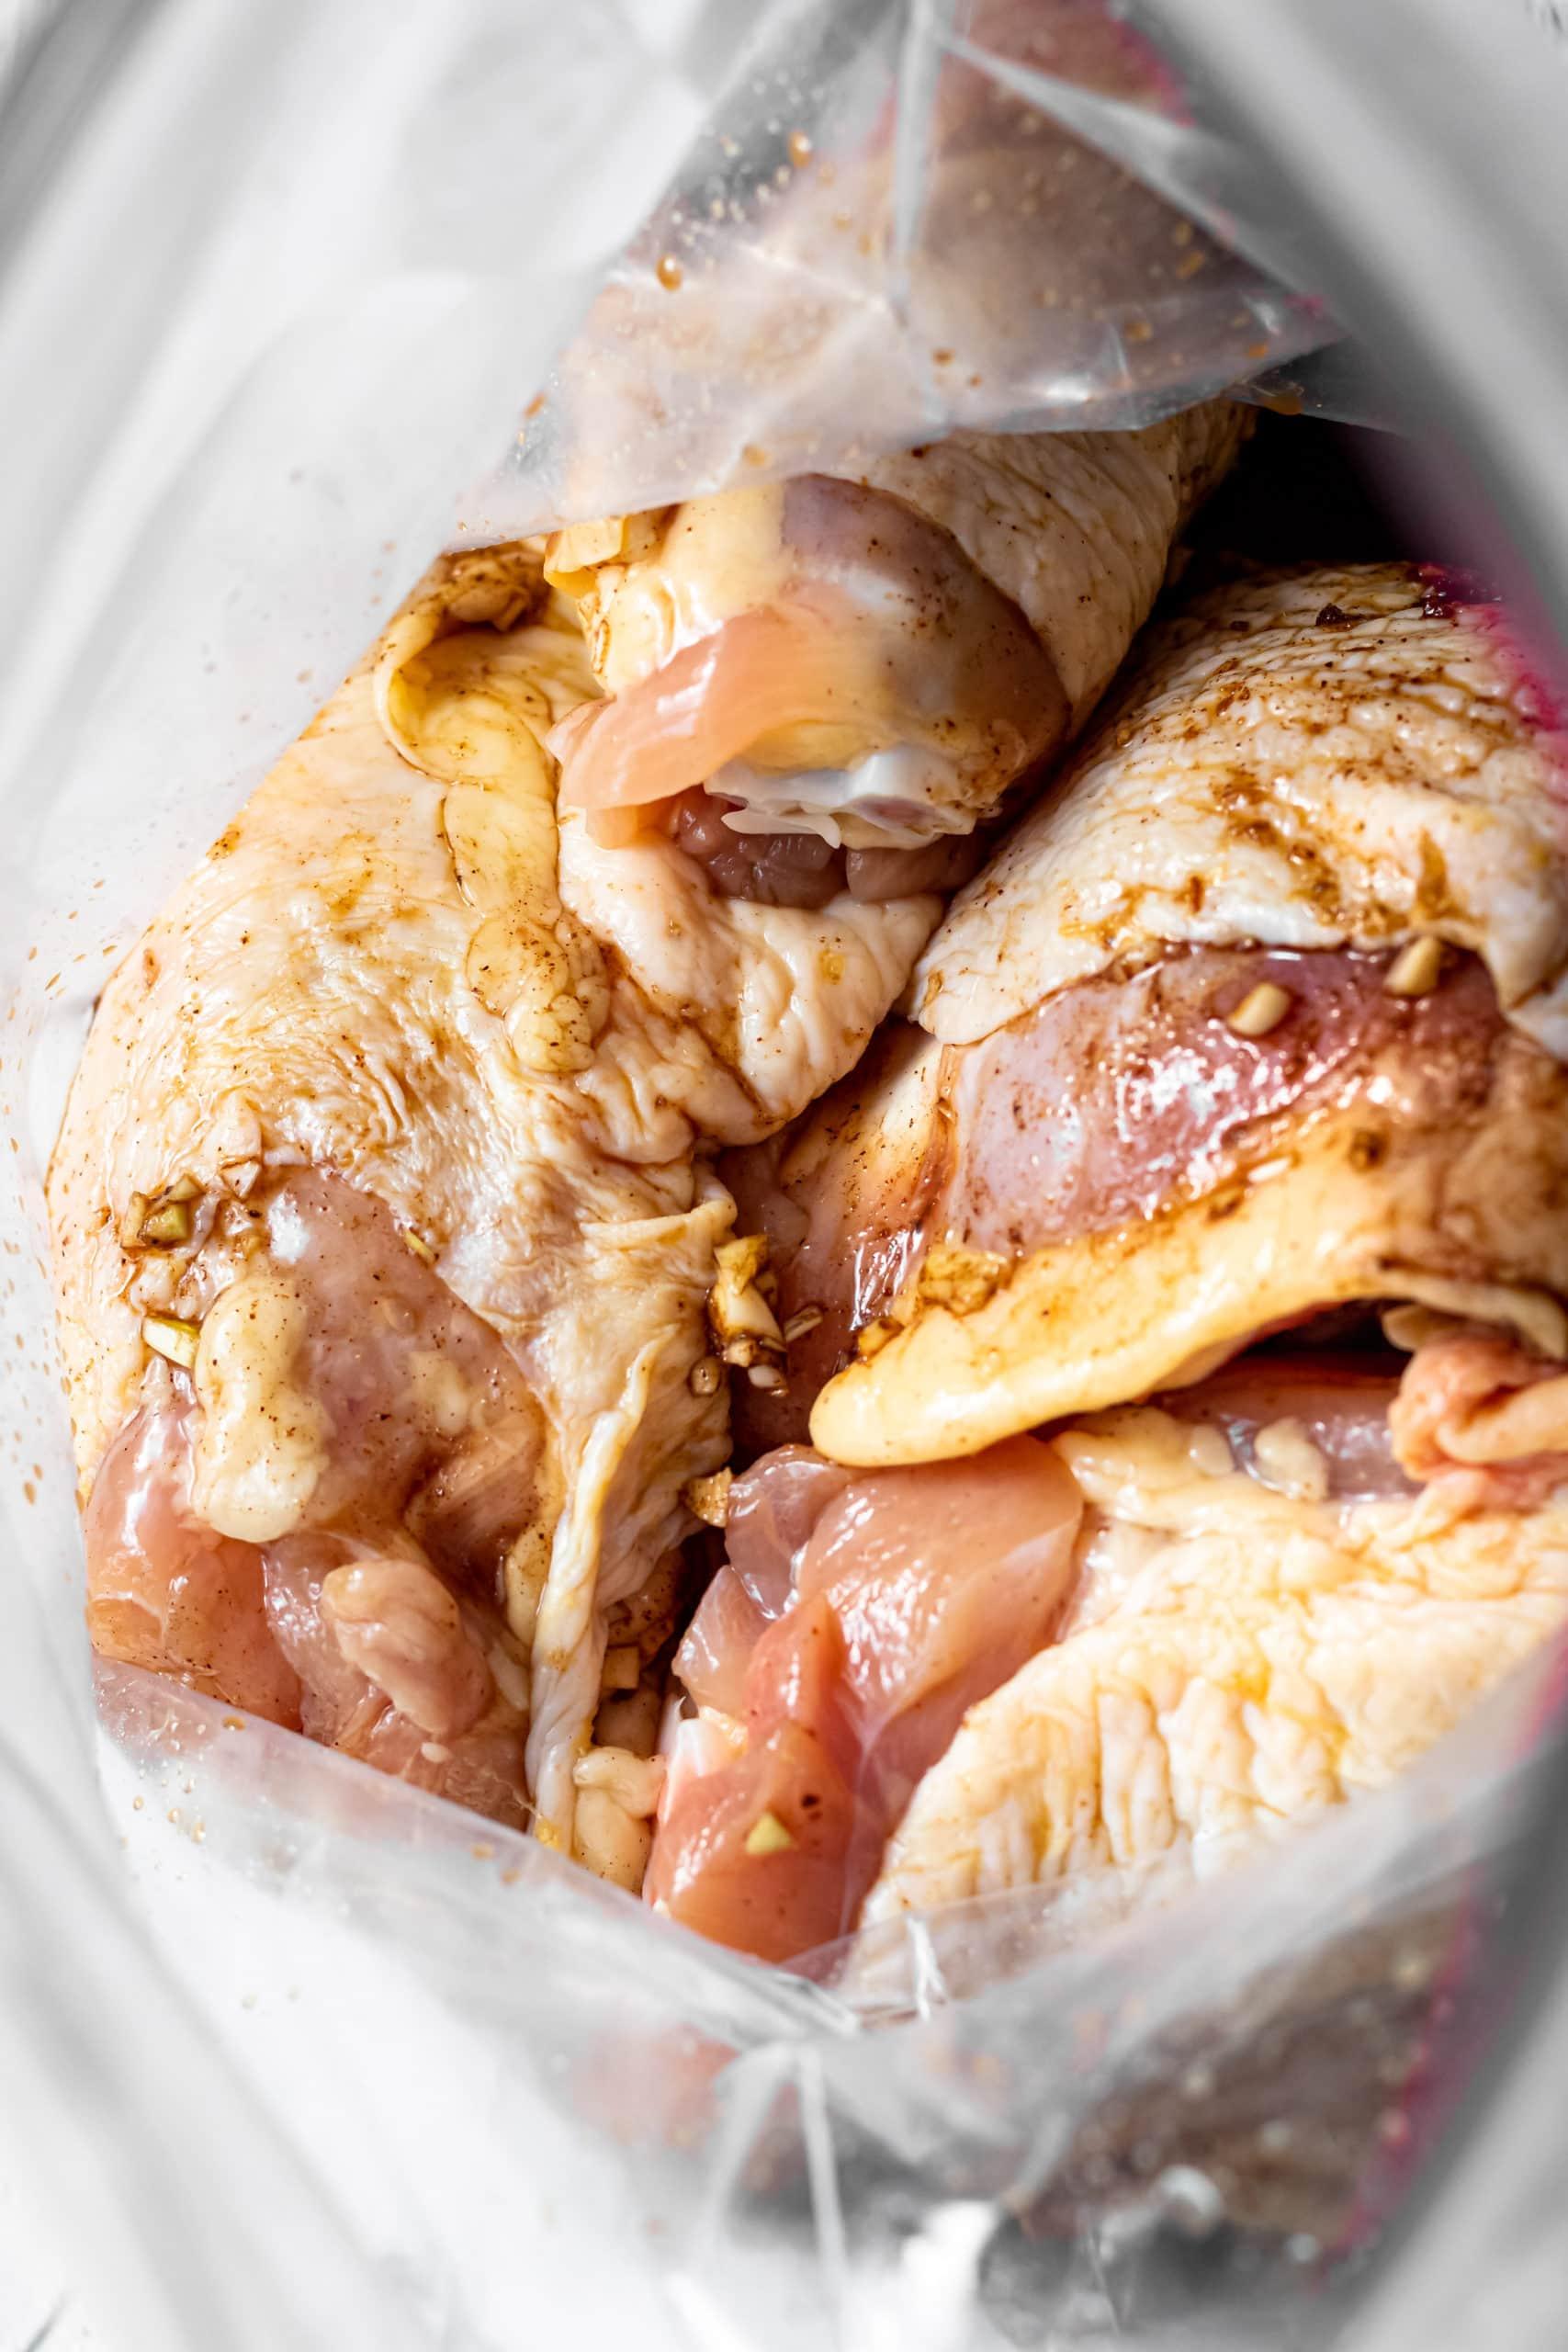 marinading the chicken